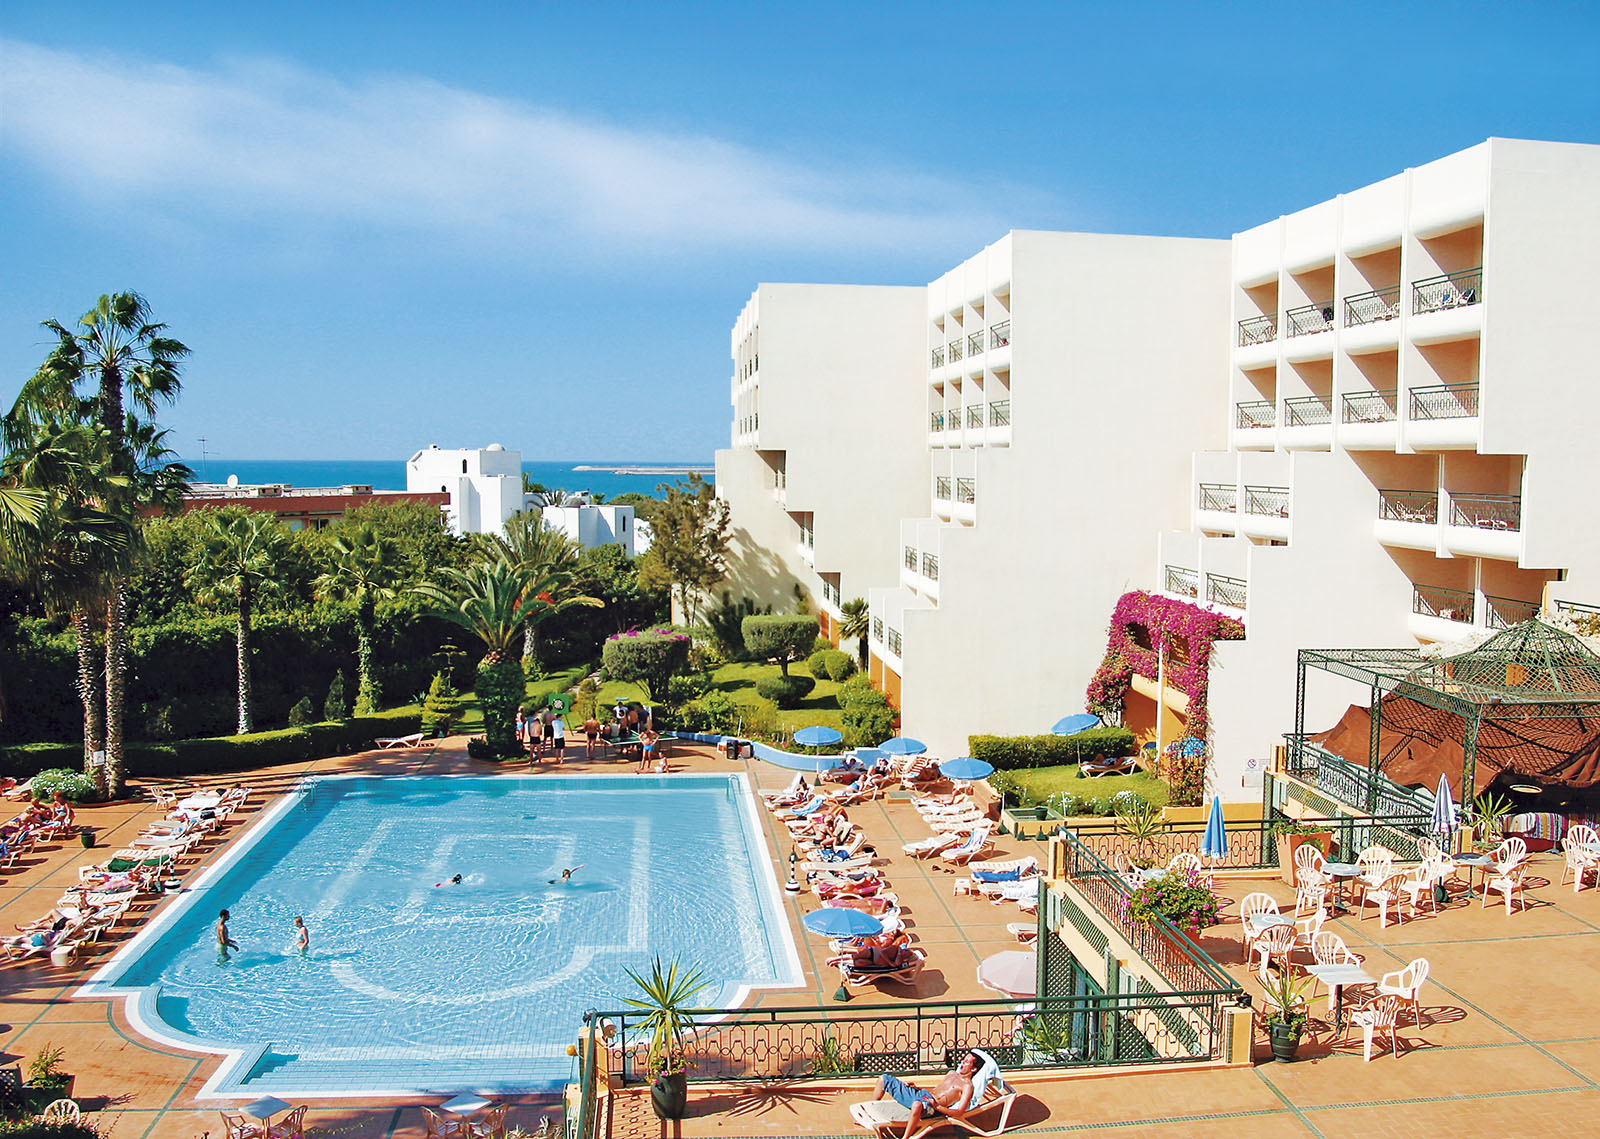 http://www.budavartours.hu/binaries//content/gallery/budavar/locations/accomodations/Marokk%C3%B3/Agadir/Argana+Hotel/argana_hotel_agadir_epulet.jpg